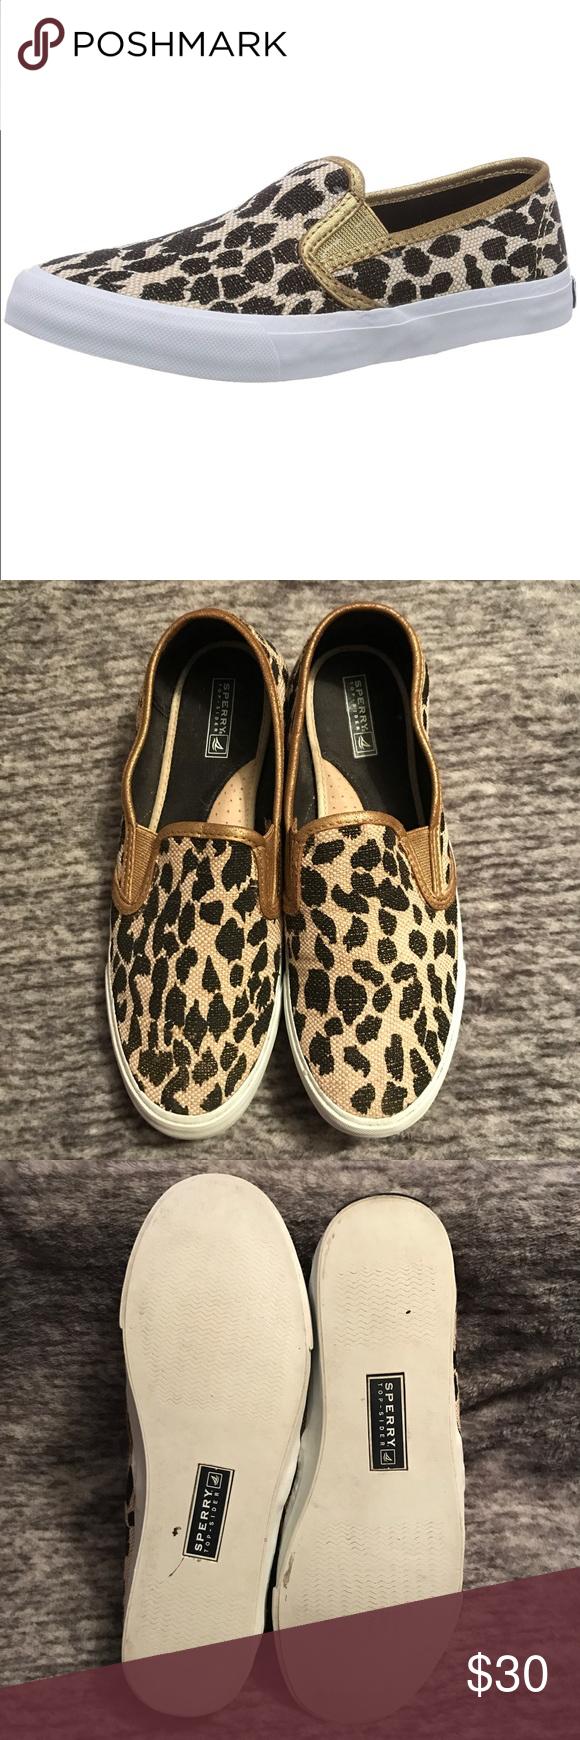 Sperry Seaside Luxe Gold Leopard Print